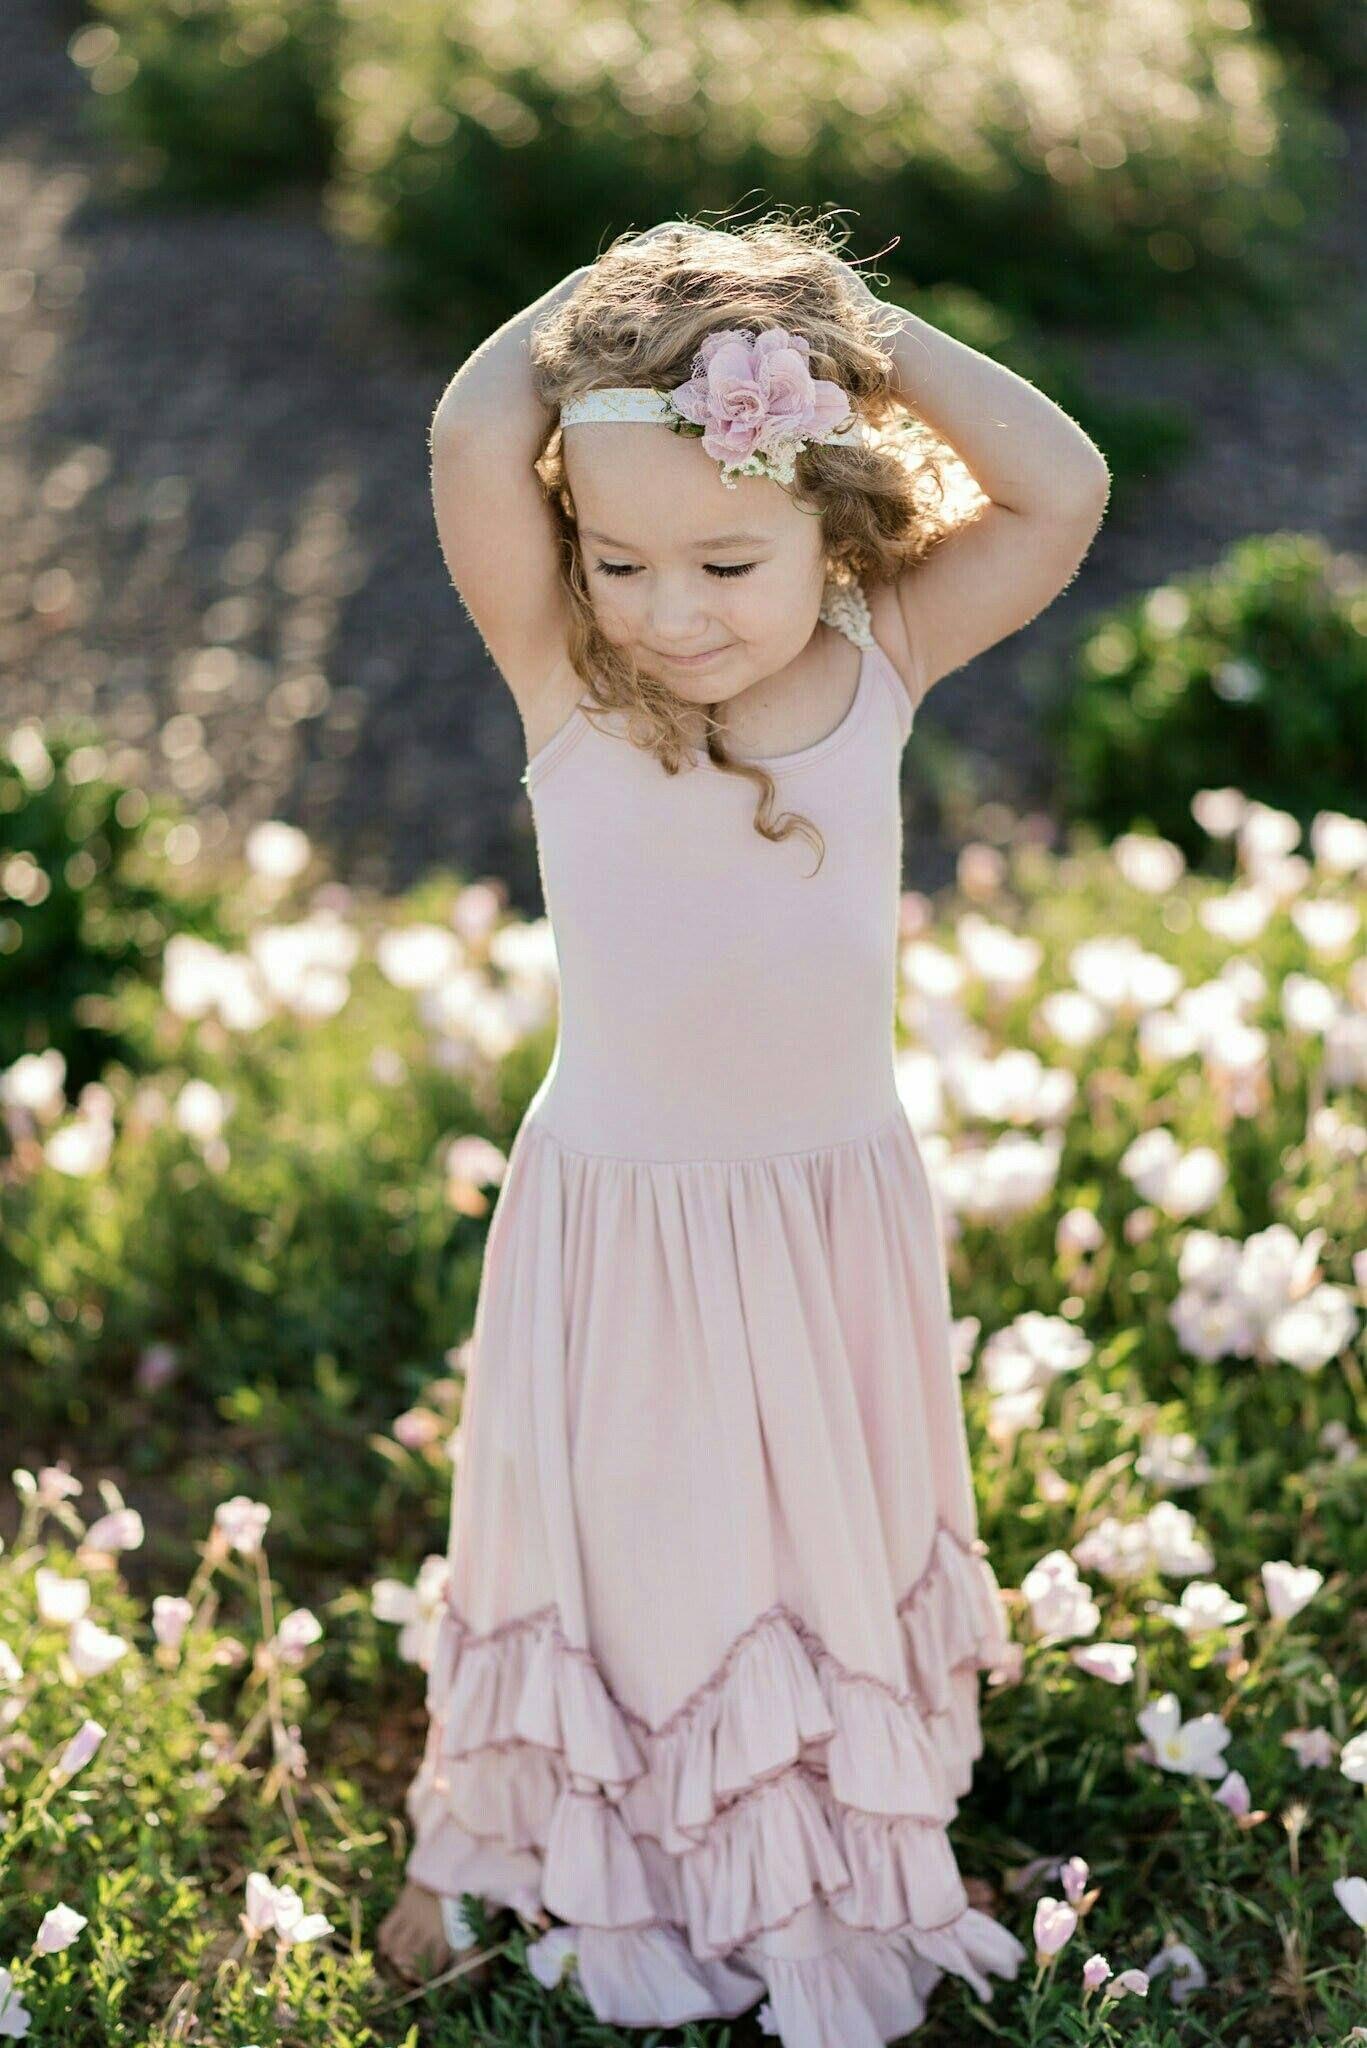 7f1e40ee0a380 Boho Baby - Blush Toddler Dress - Boho Flower Girl Dress - Rustic Flower  Girl Dress - Blush Wedding - SAVE 20% off with code: PIN20